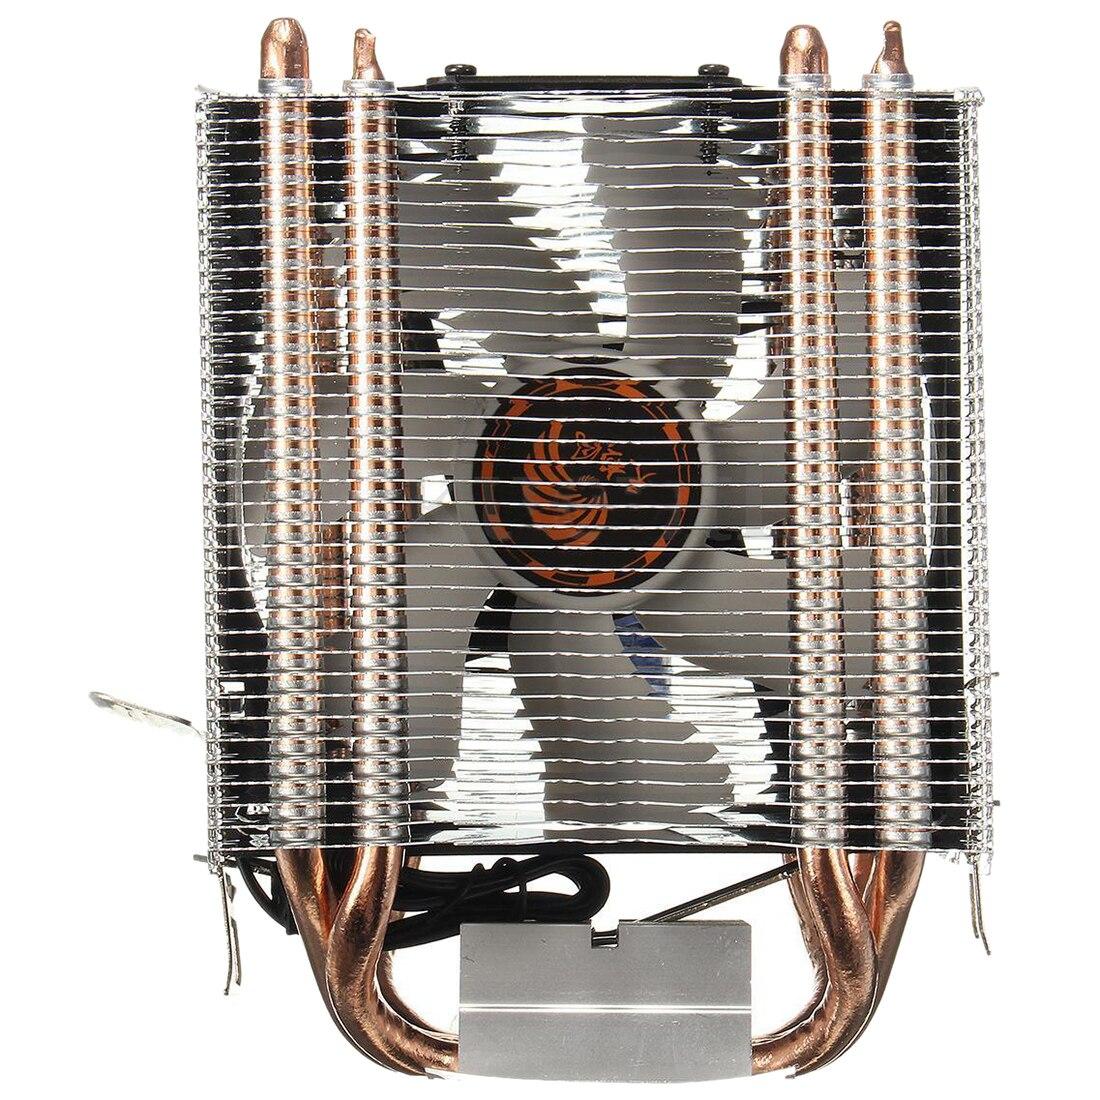 4 Heatpipe CPU Cooler Dissipatore di Calore di raffreddamento per Intel LGA 1150 1151 1155 775 1156 (PER AMD) Nuovo